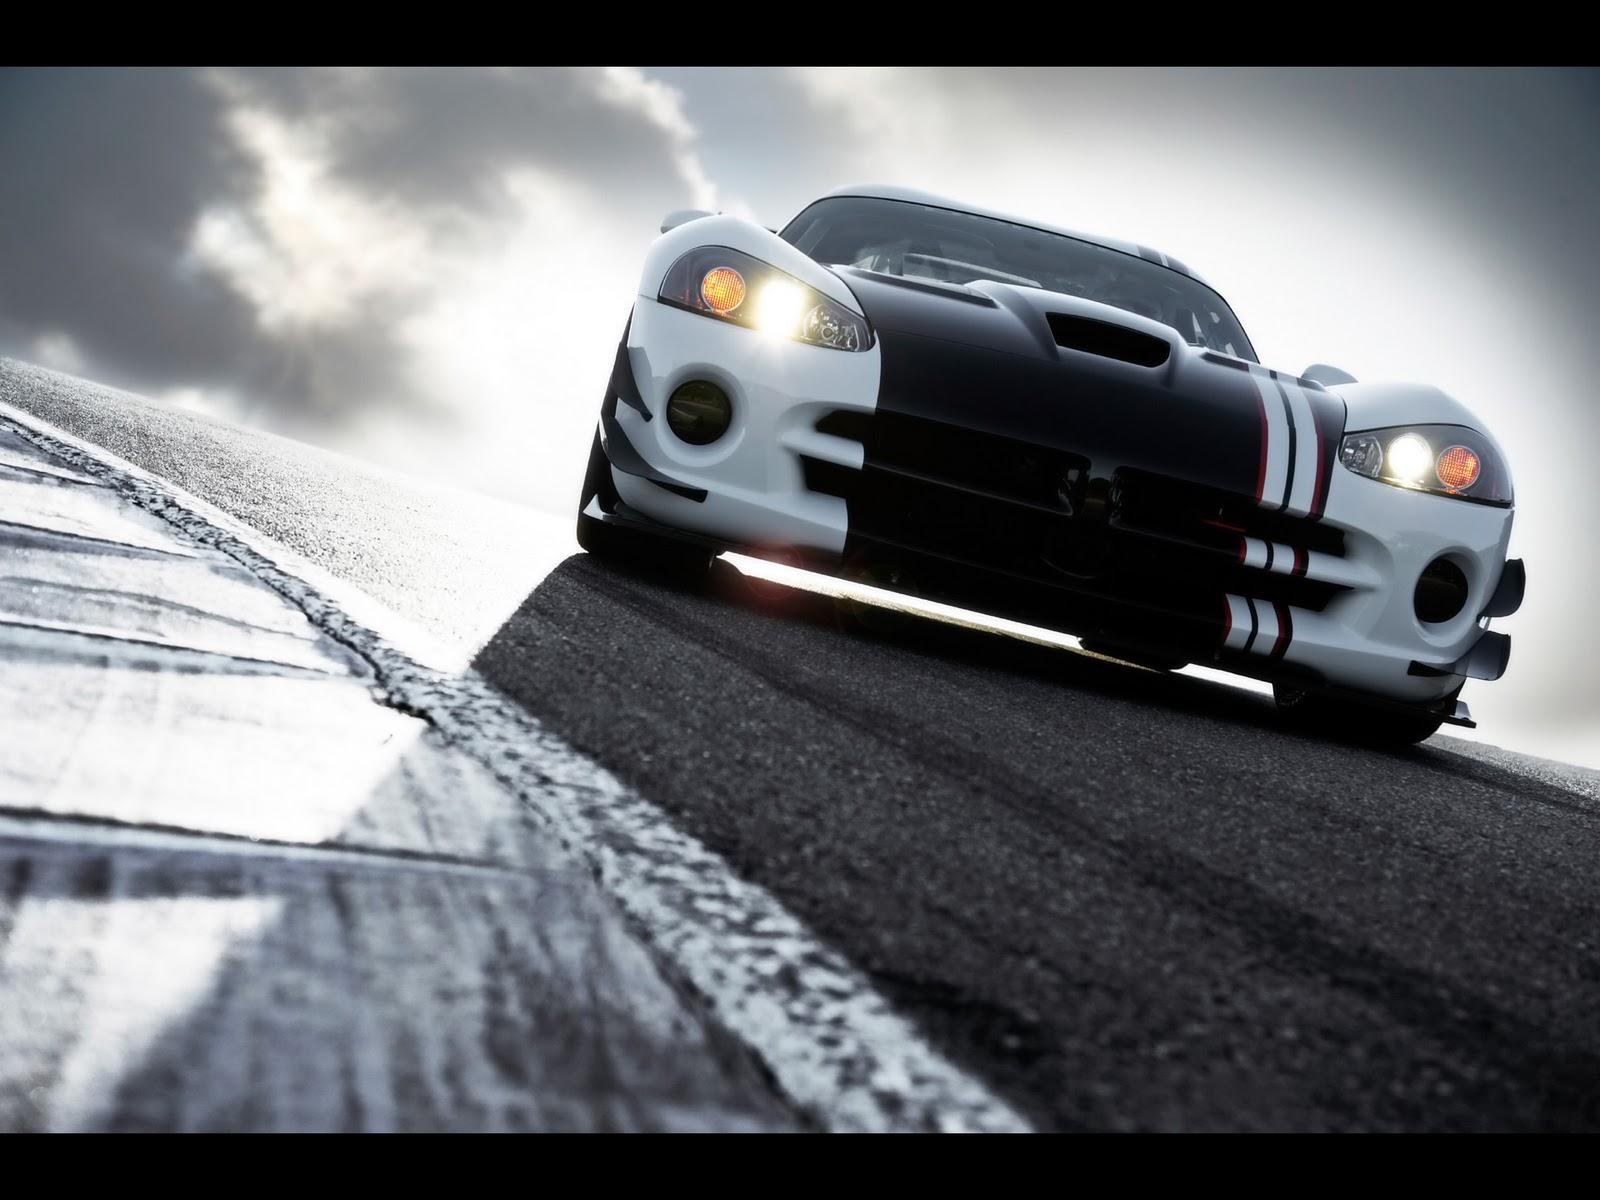 http://3.bp.blogspot.com/-SpwMtQnqg6E/UPh6fOymPQI/AAAAAAAAPJU/5xi6TO4OF1g/s1600/2010-Dodge-Viper-SRT10-ACR-X-Front-Angle-Tilt-2-1920x1440.jpg